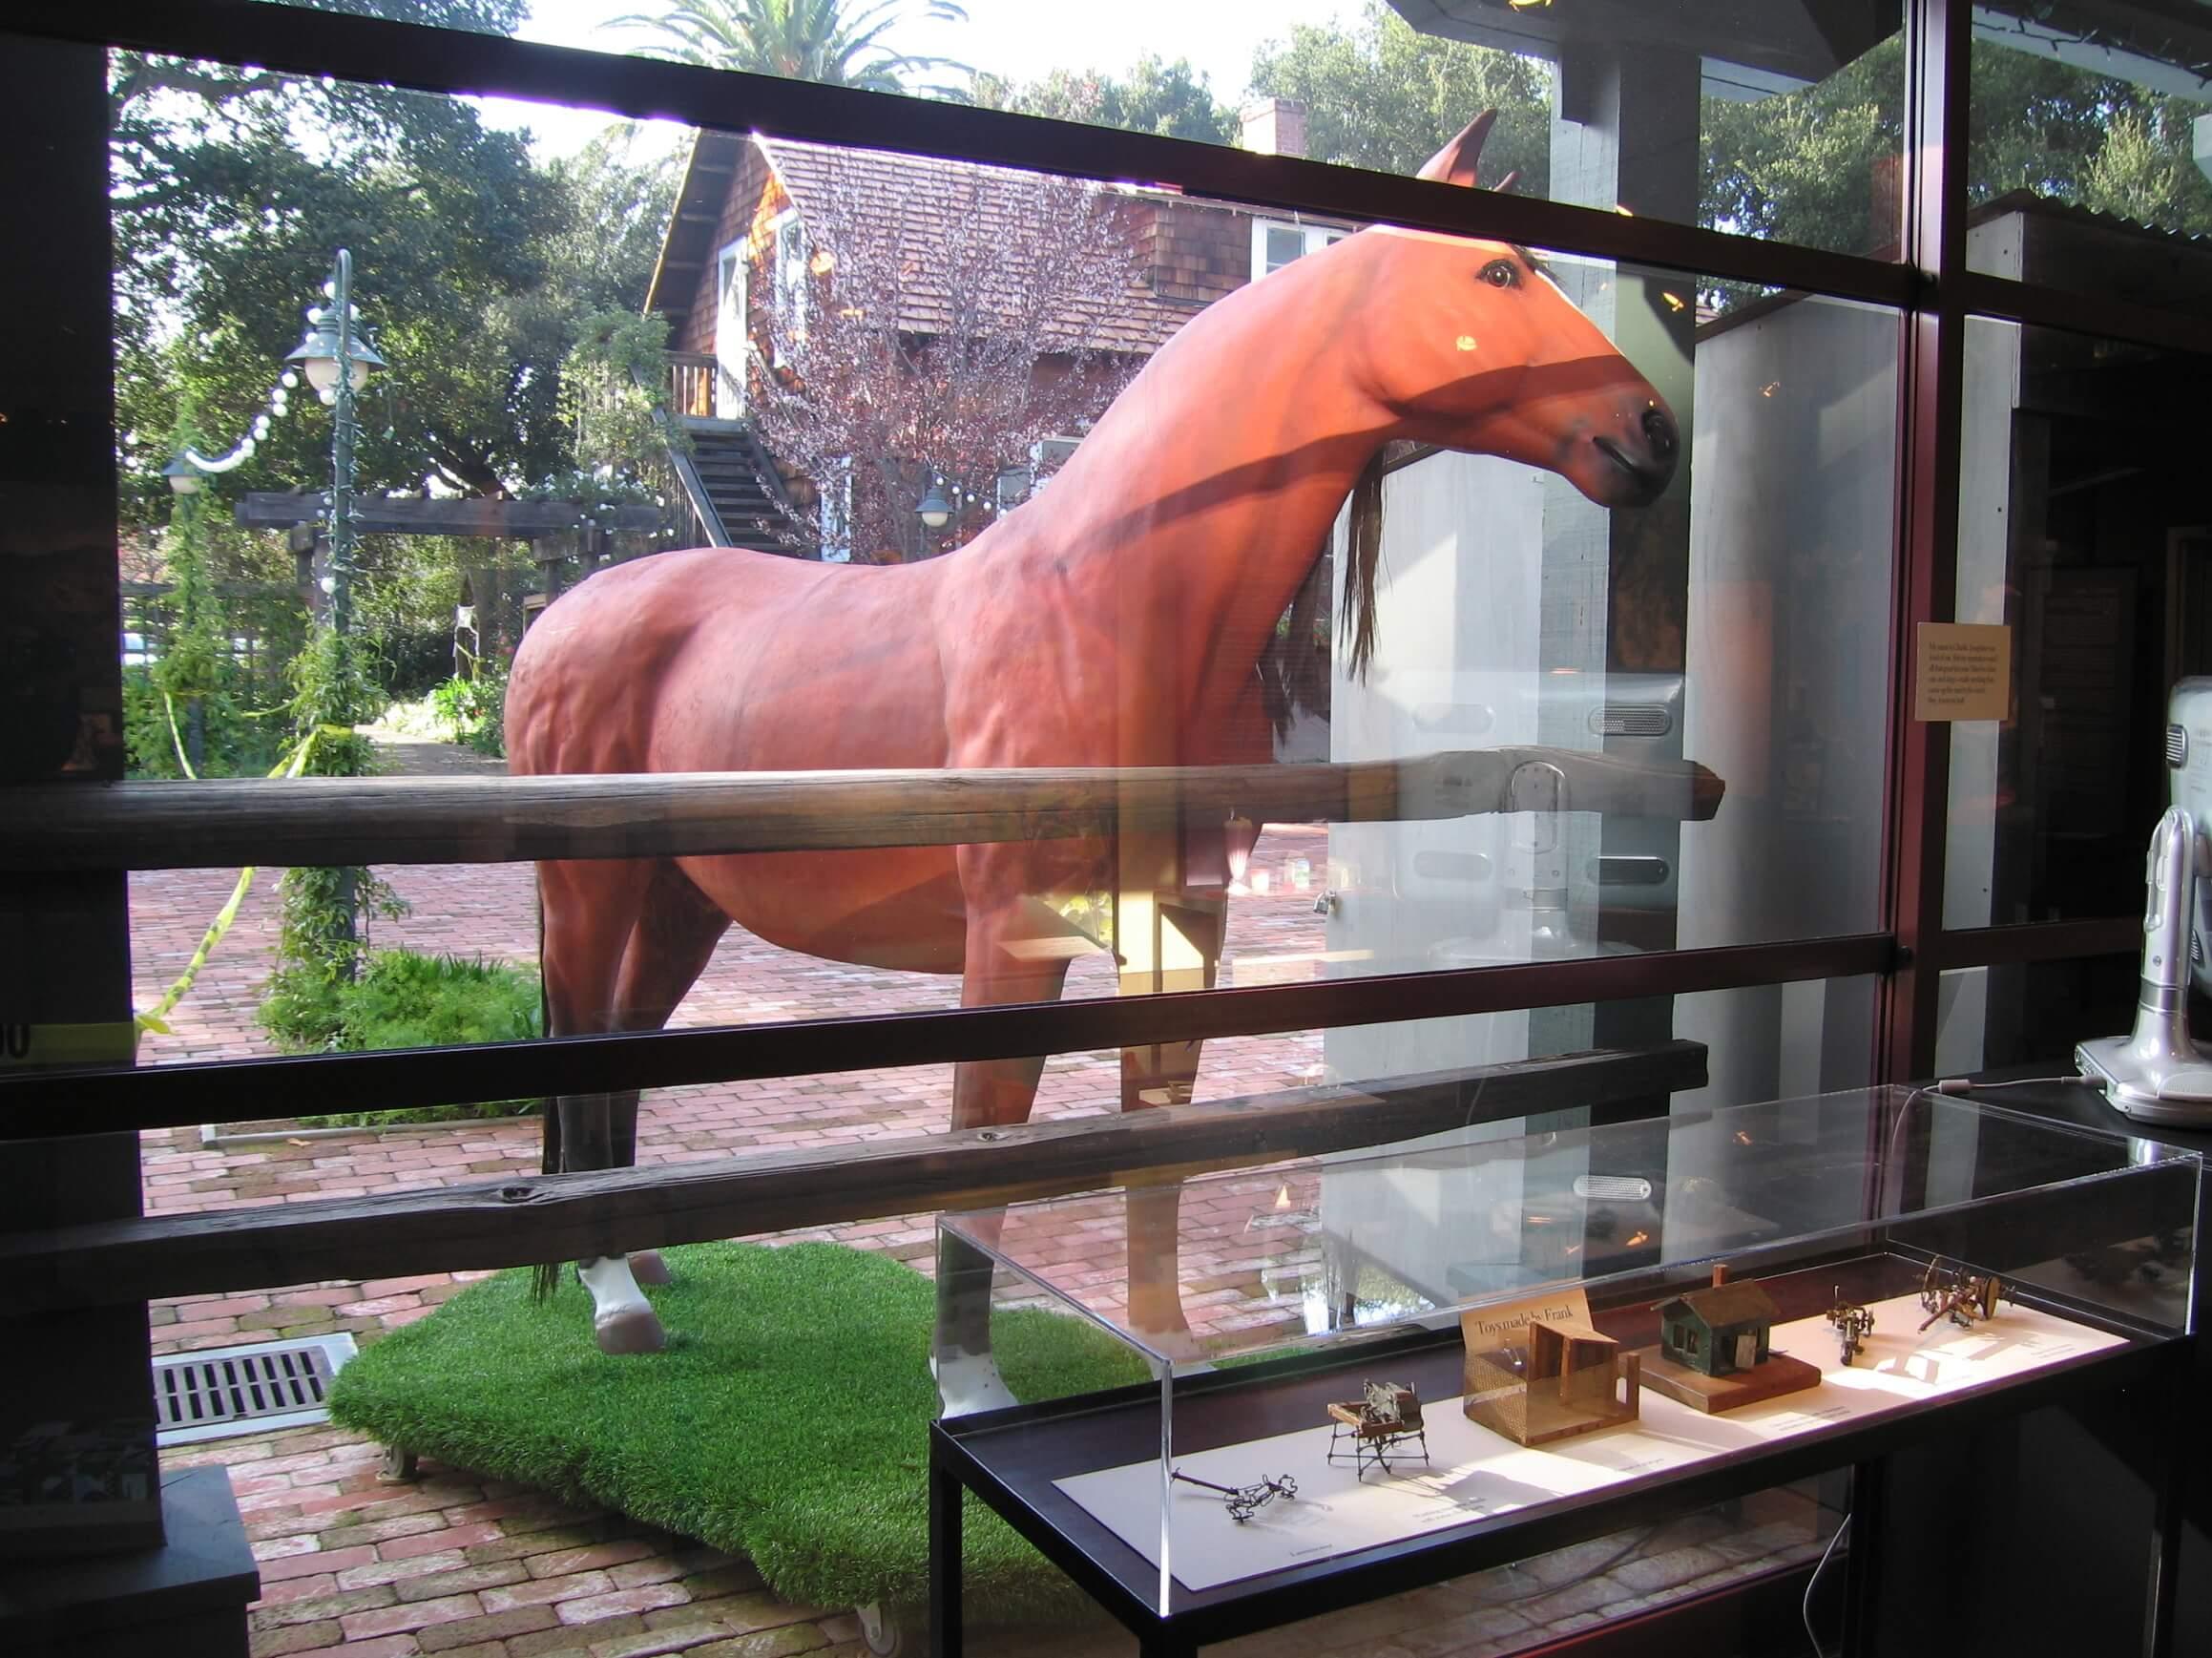 15-Los-Altos-History-Museum-The Sibbett Group-Edna-Horse.jpg